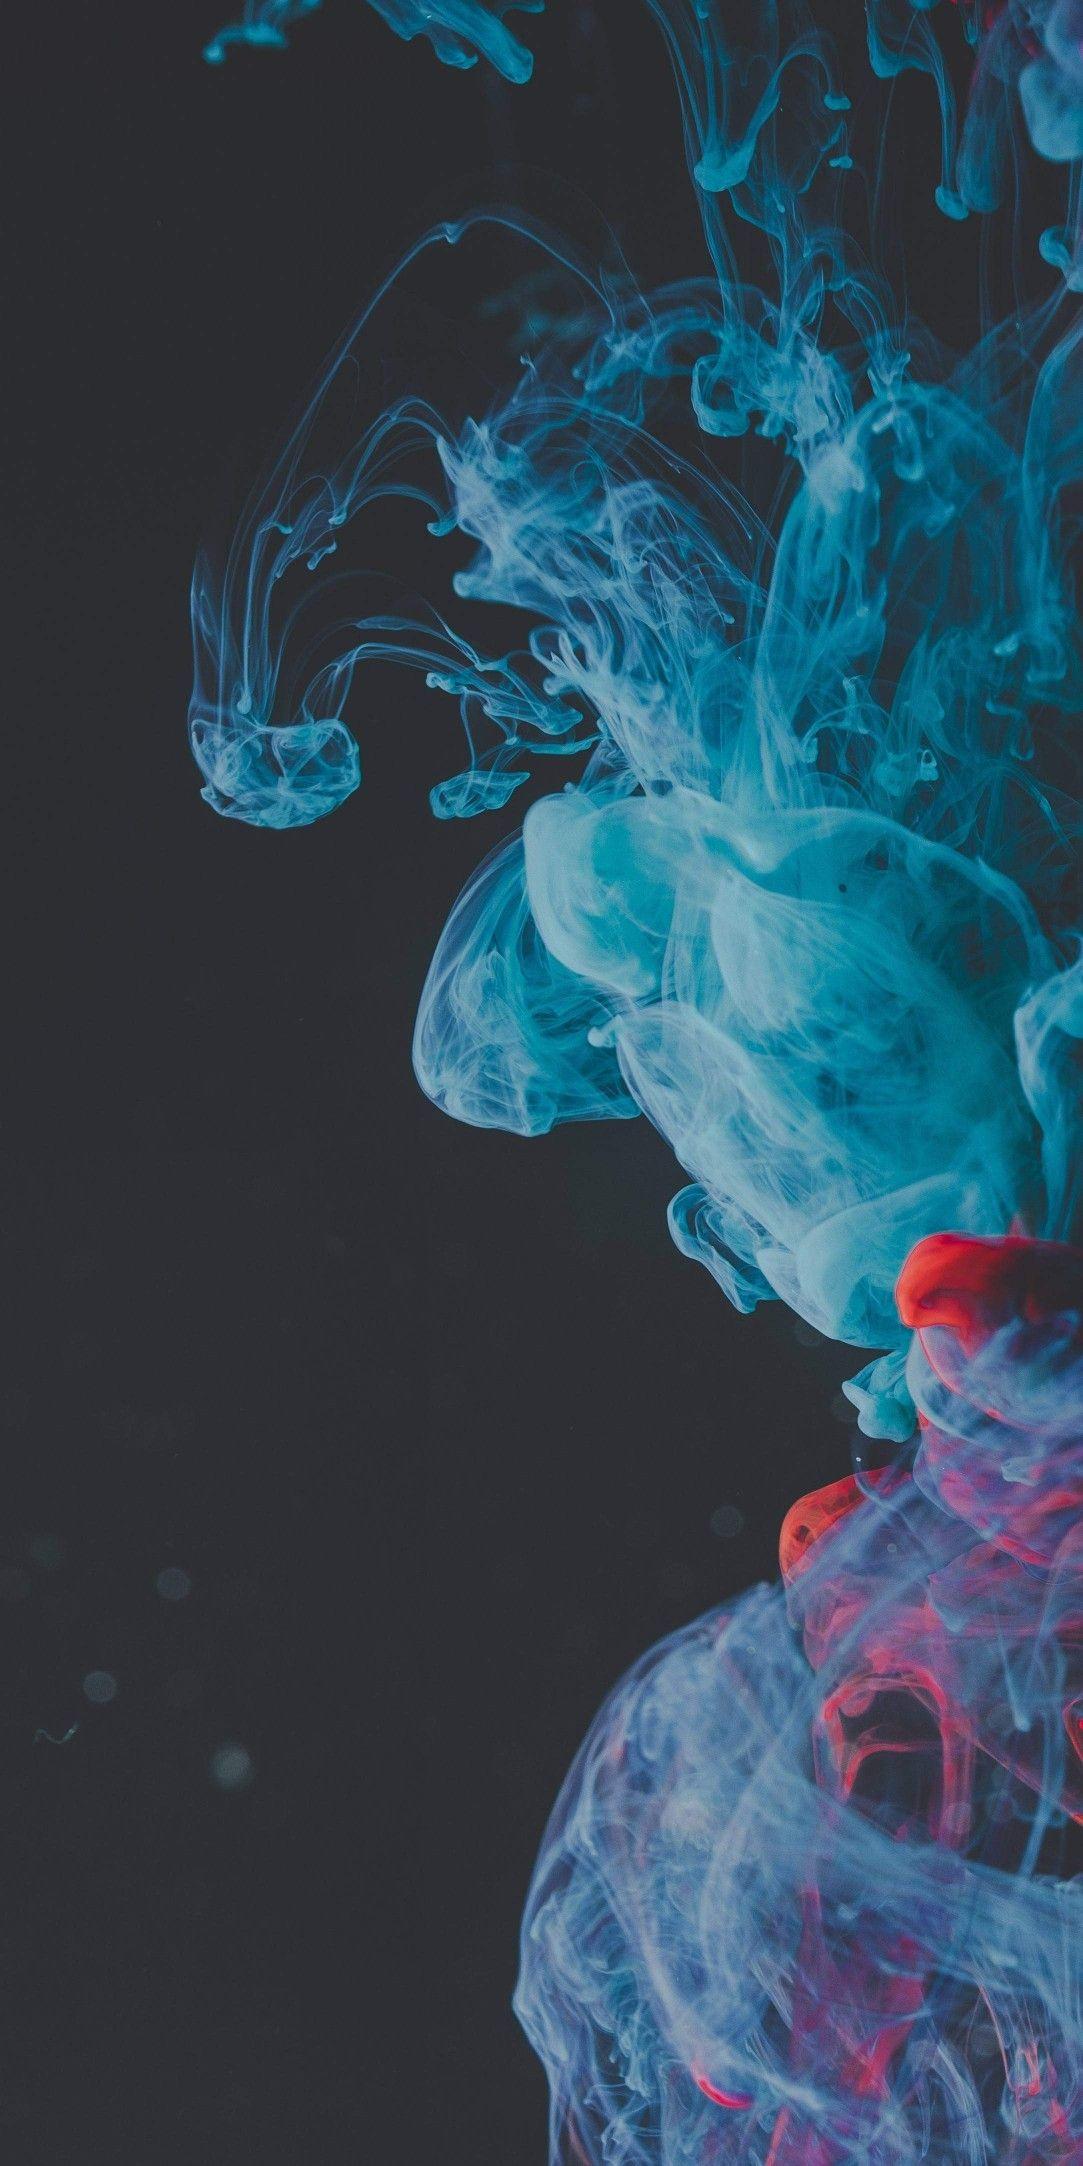 Smoking Aesthetic Wallpapers Wallpaper Cave